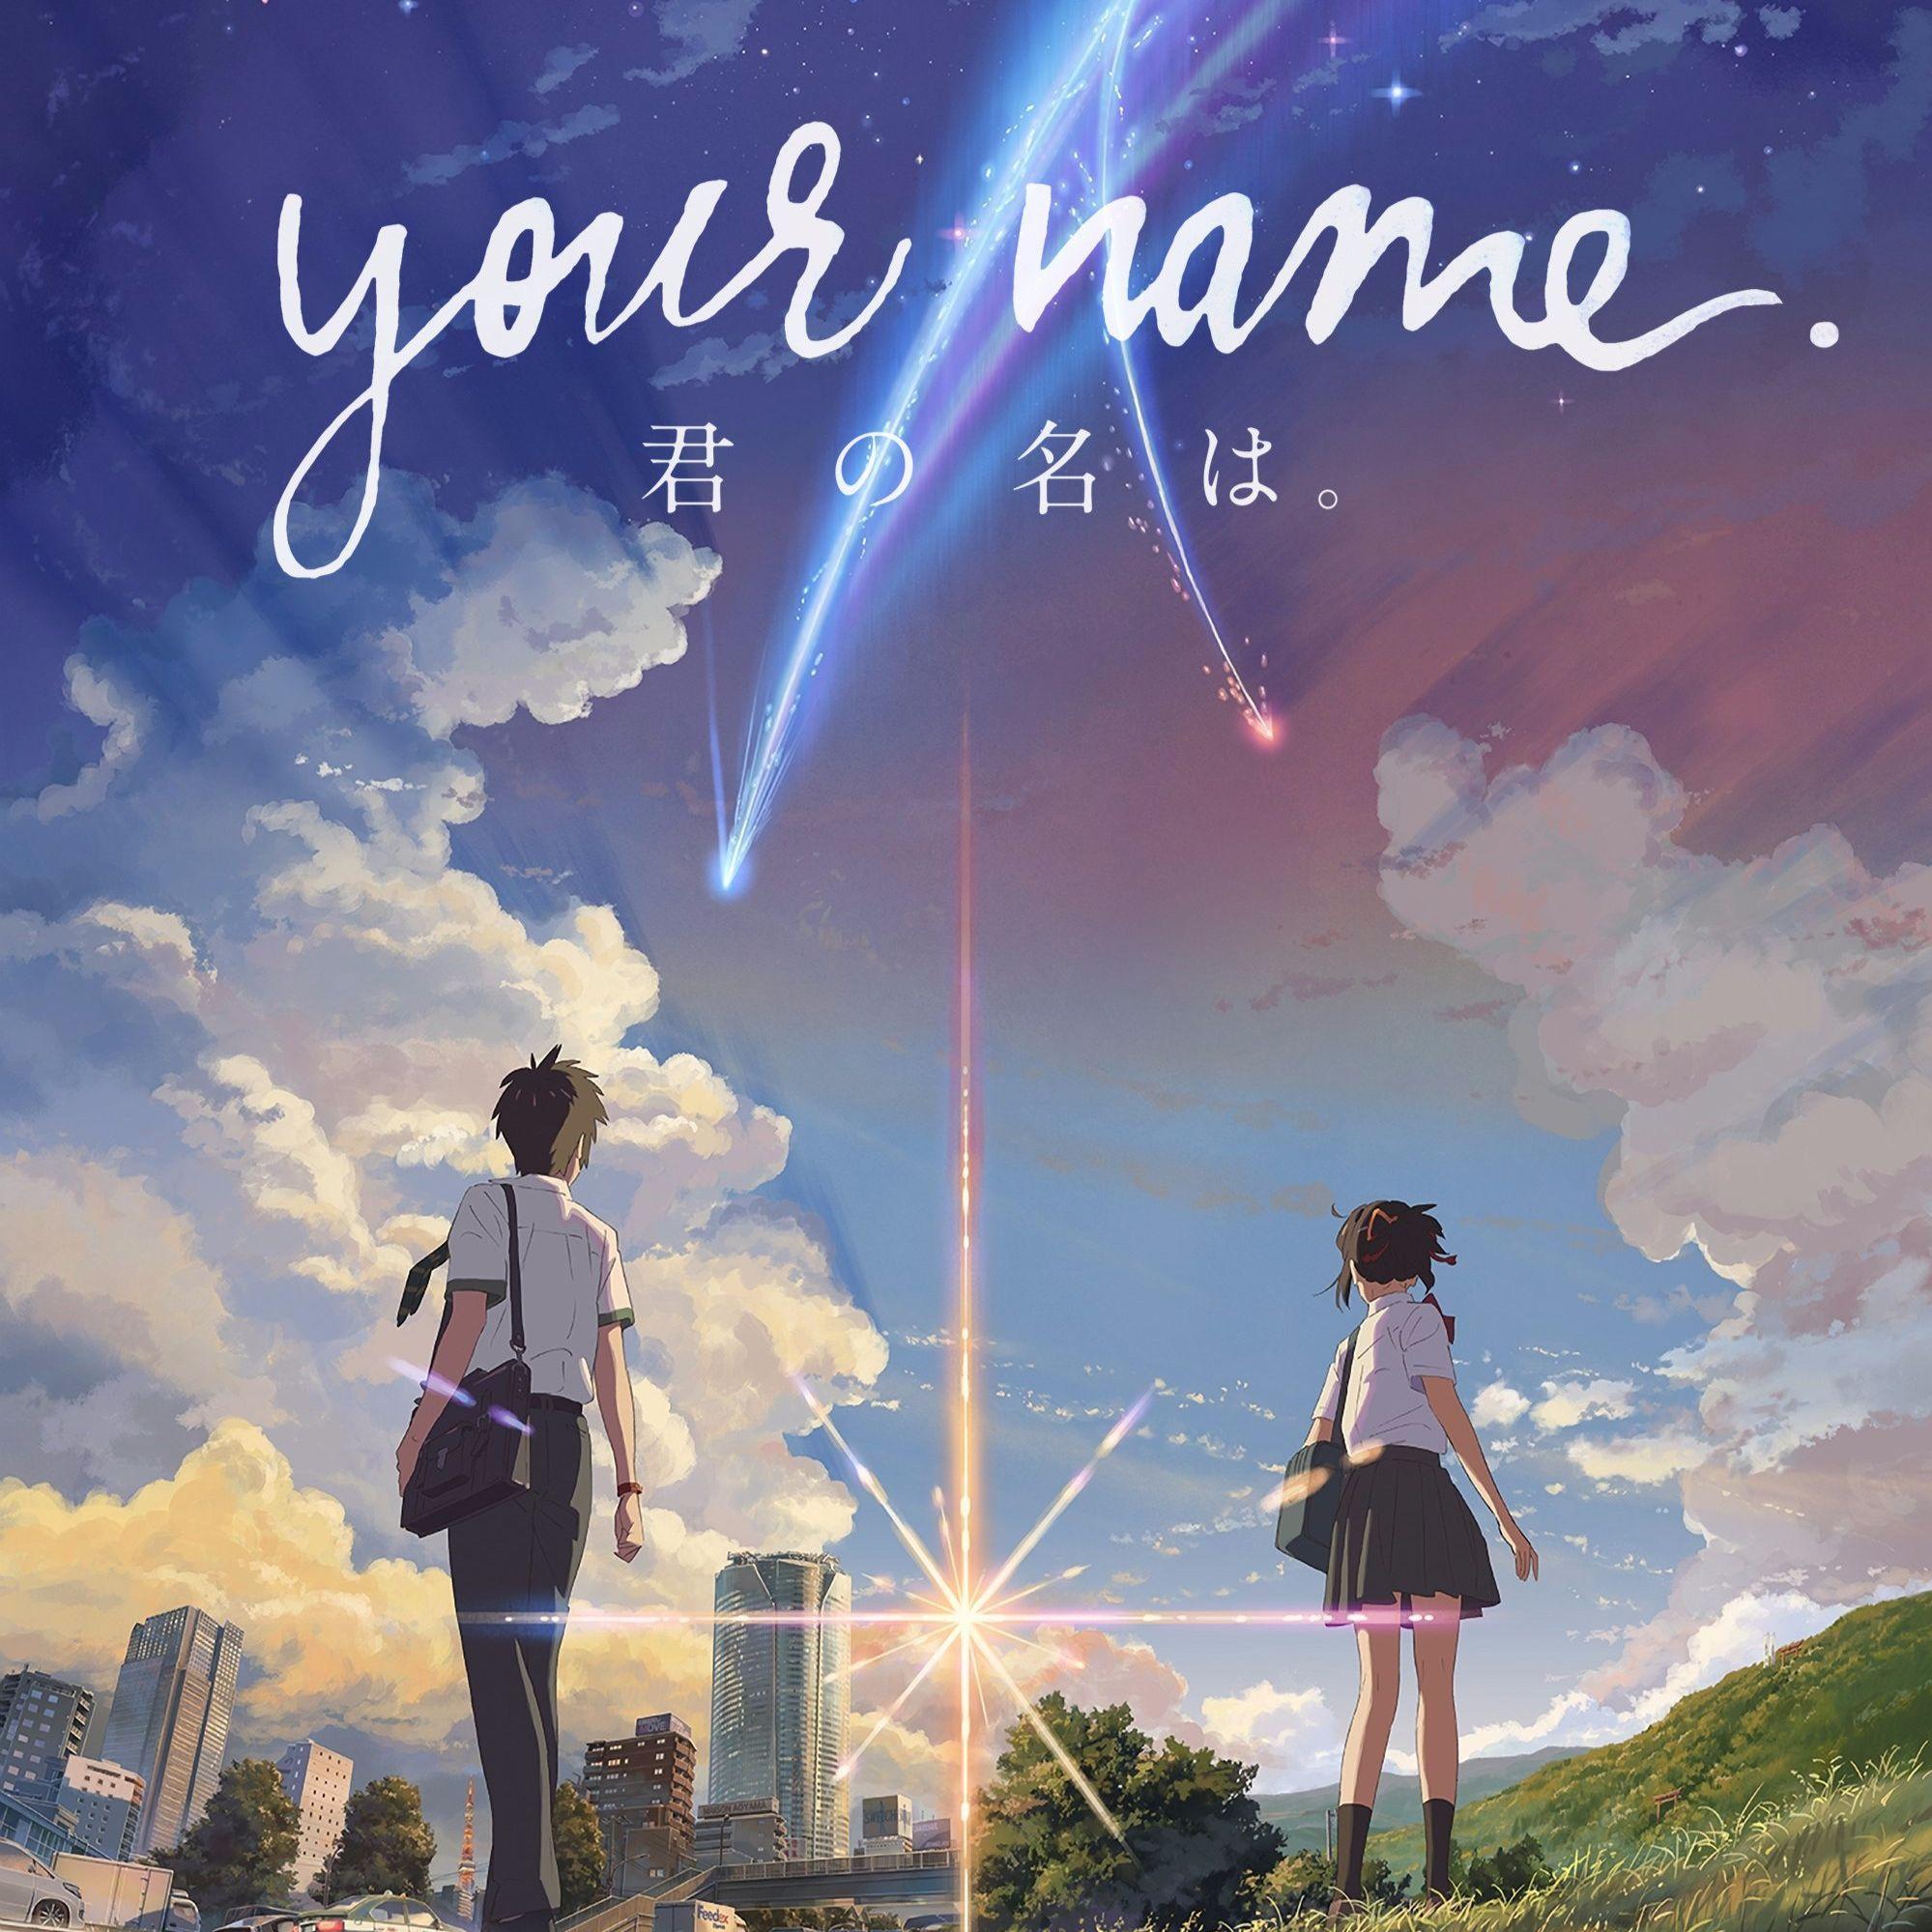 Episode 80: Your Name